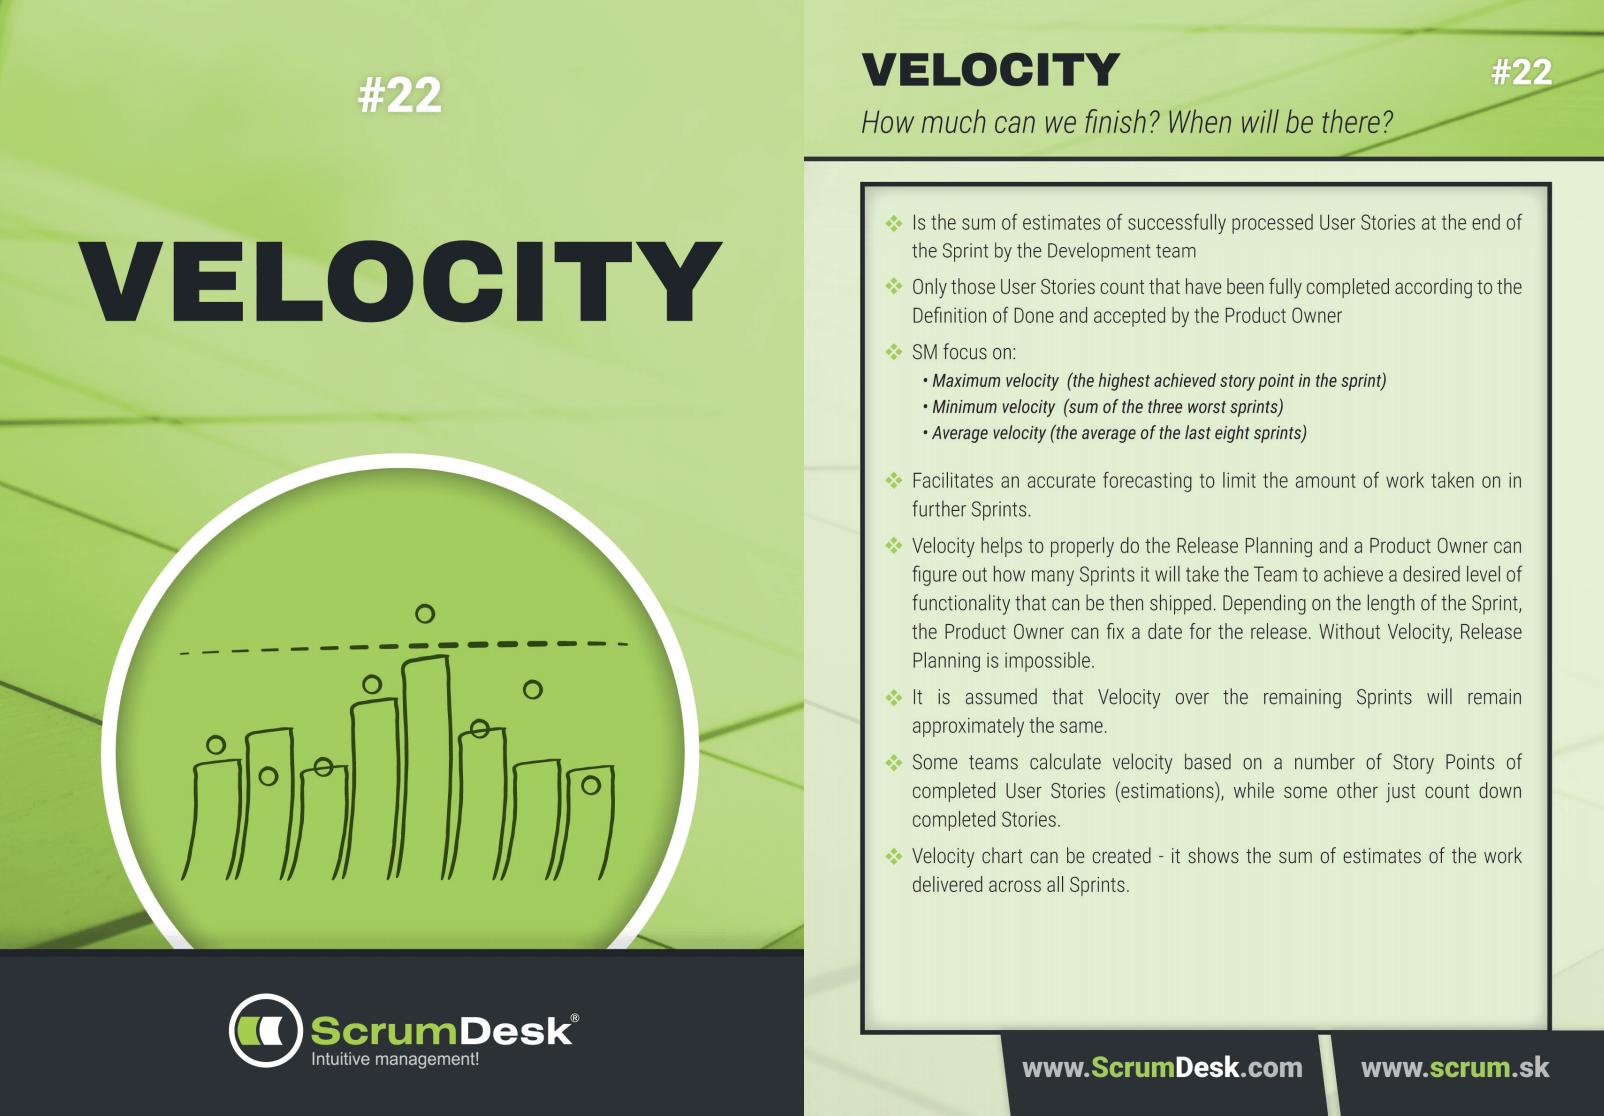 Scrum karty 22 - Velocity